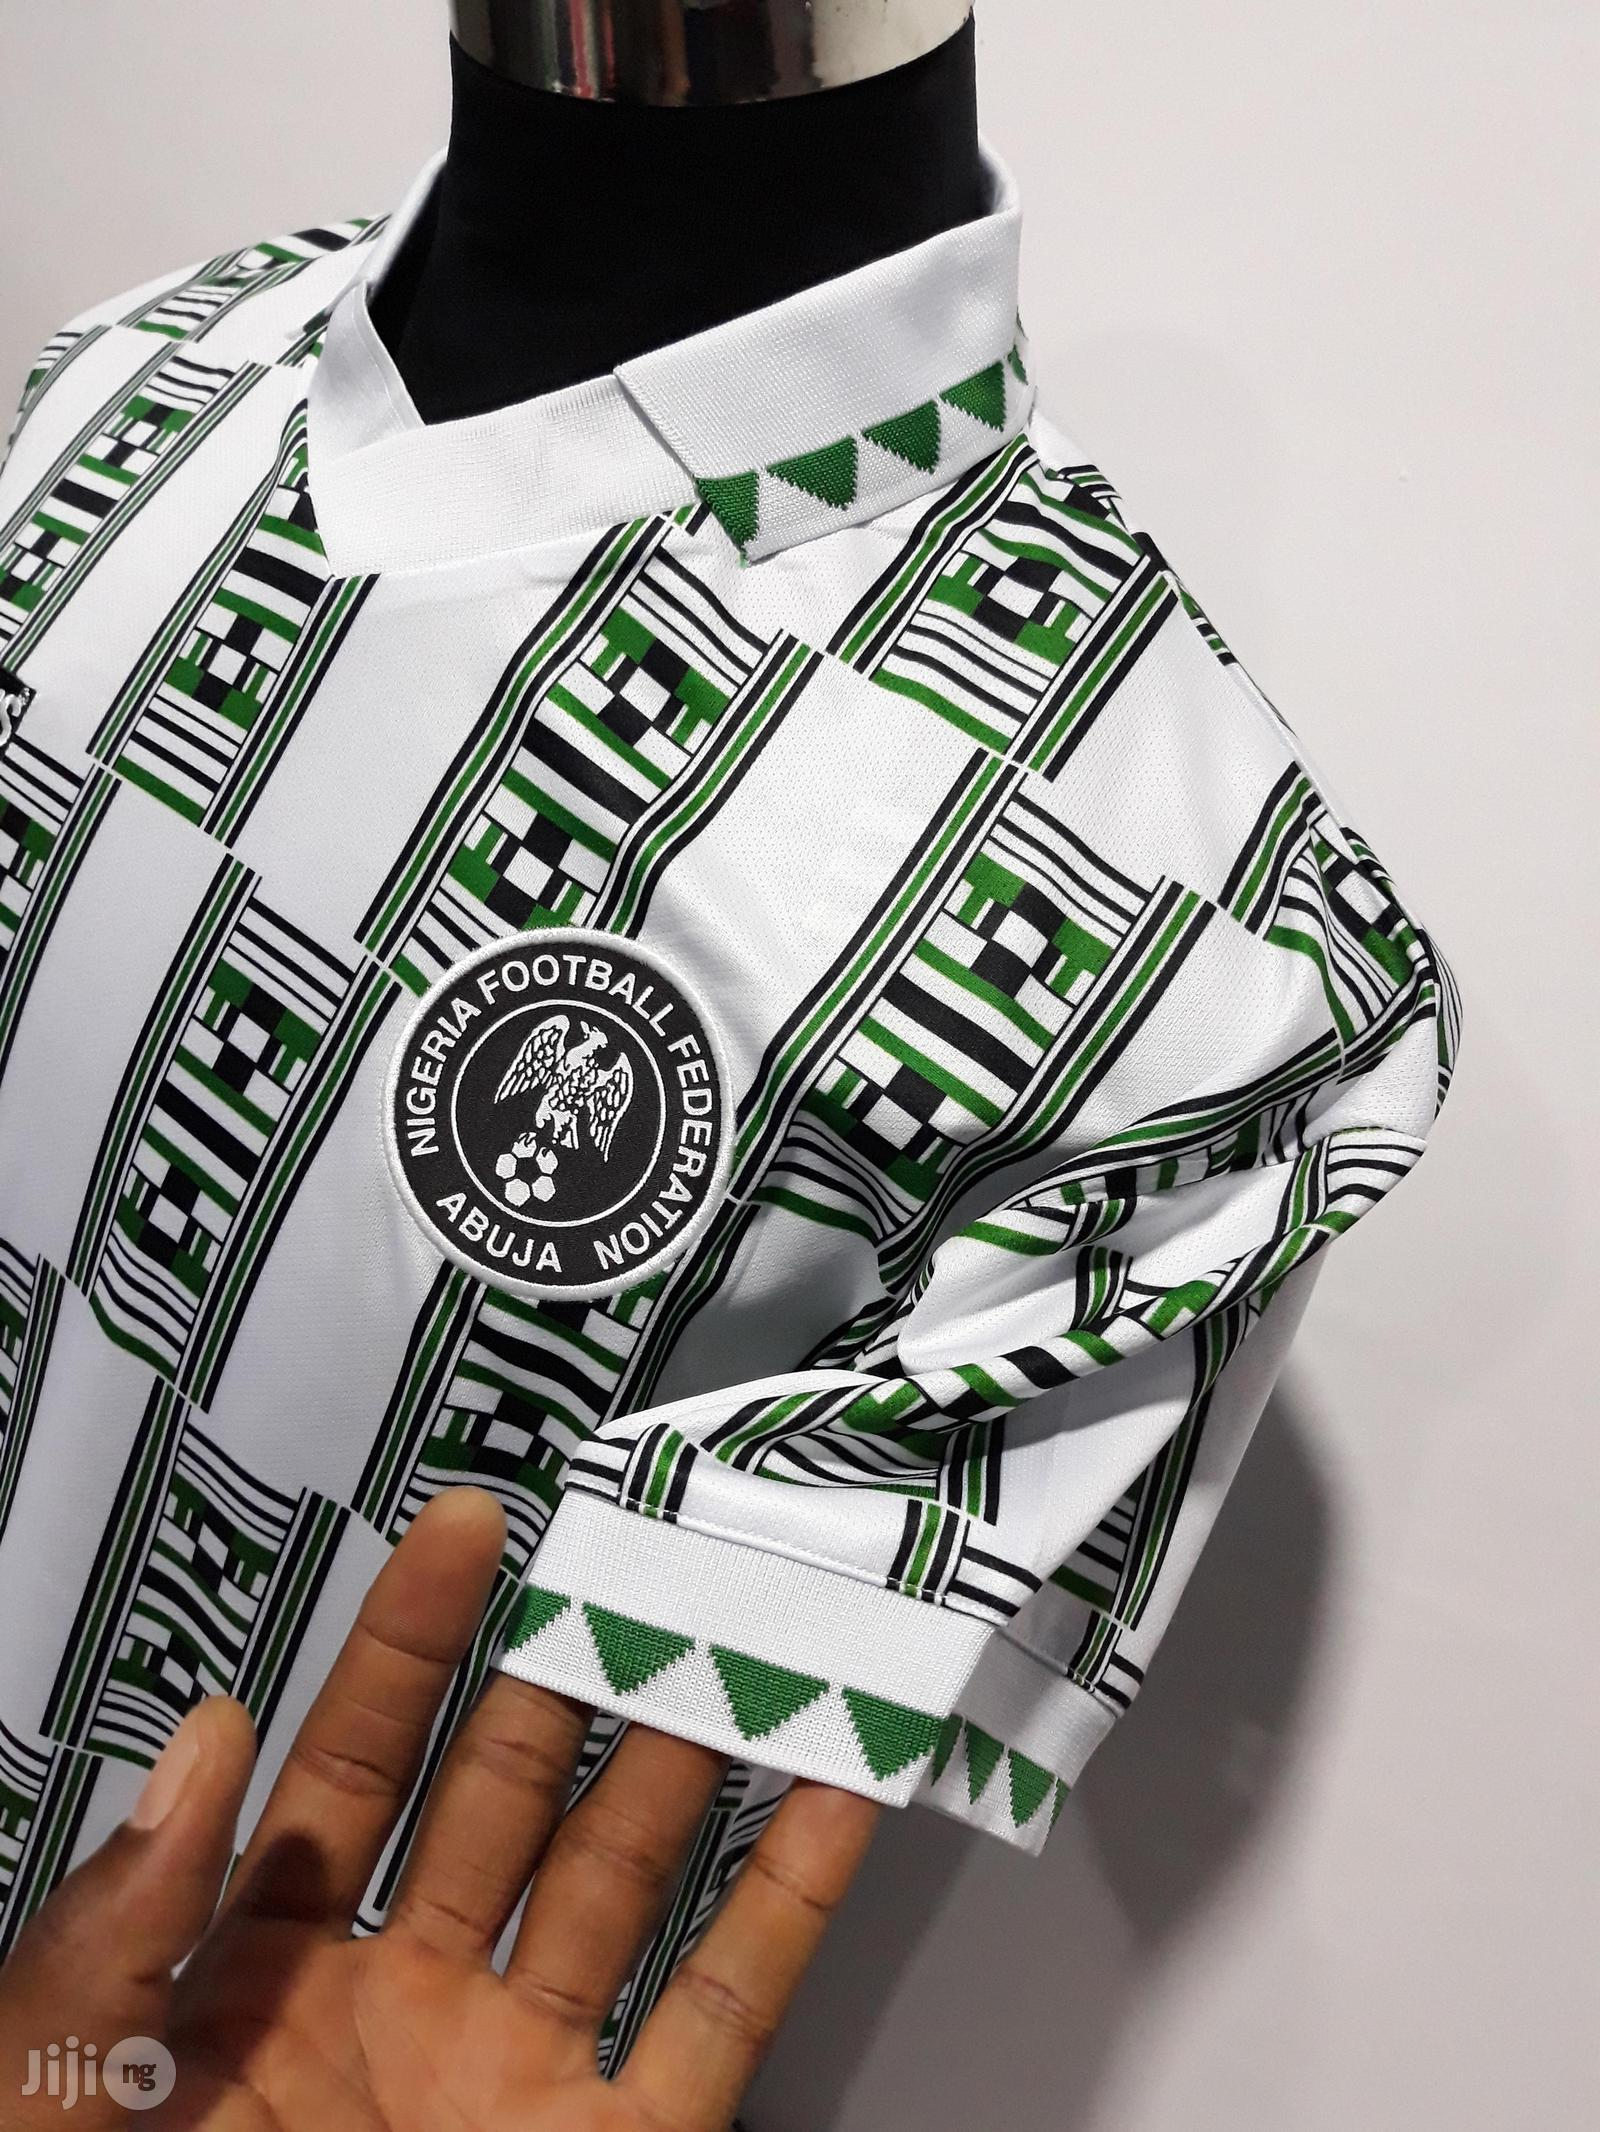 Original Nigeria 1994 World Cup Home Jersey In Surulere Clothing Romeo Nwankwo Jiji Ng For Sale In Surulere Buy Clothing From Romeo Nwankwo On Jiji Ng